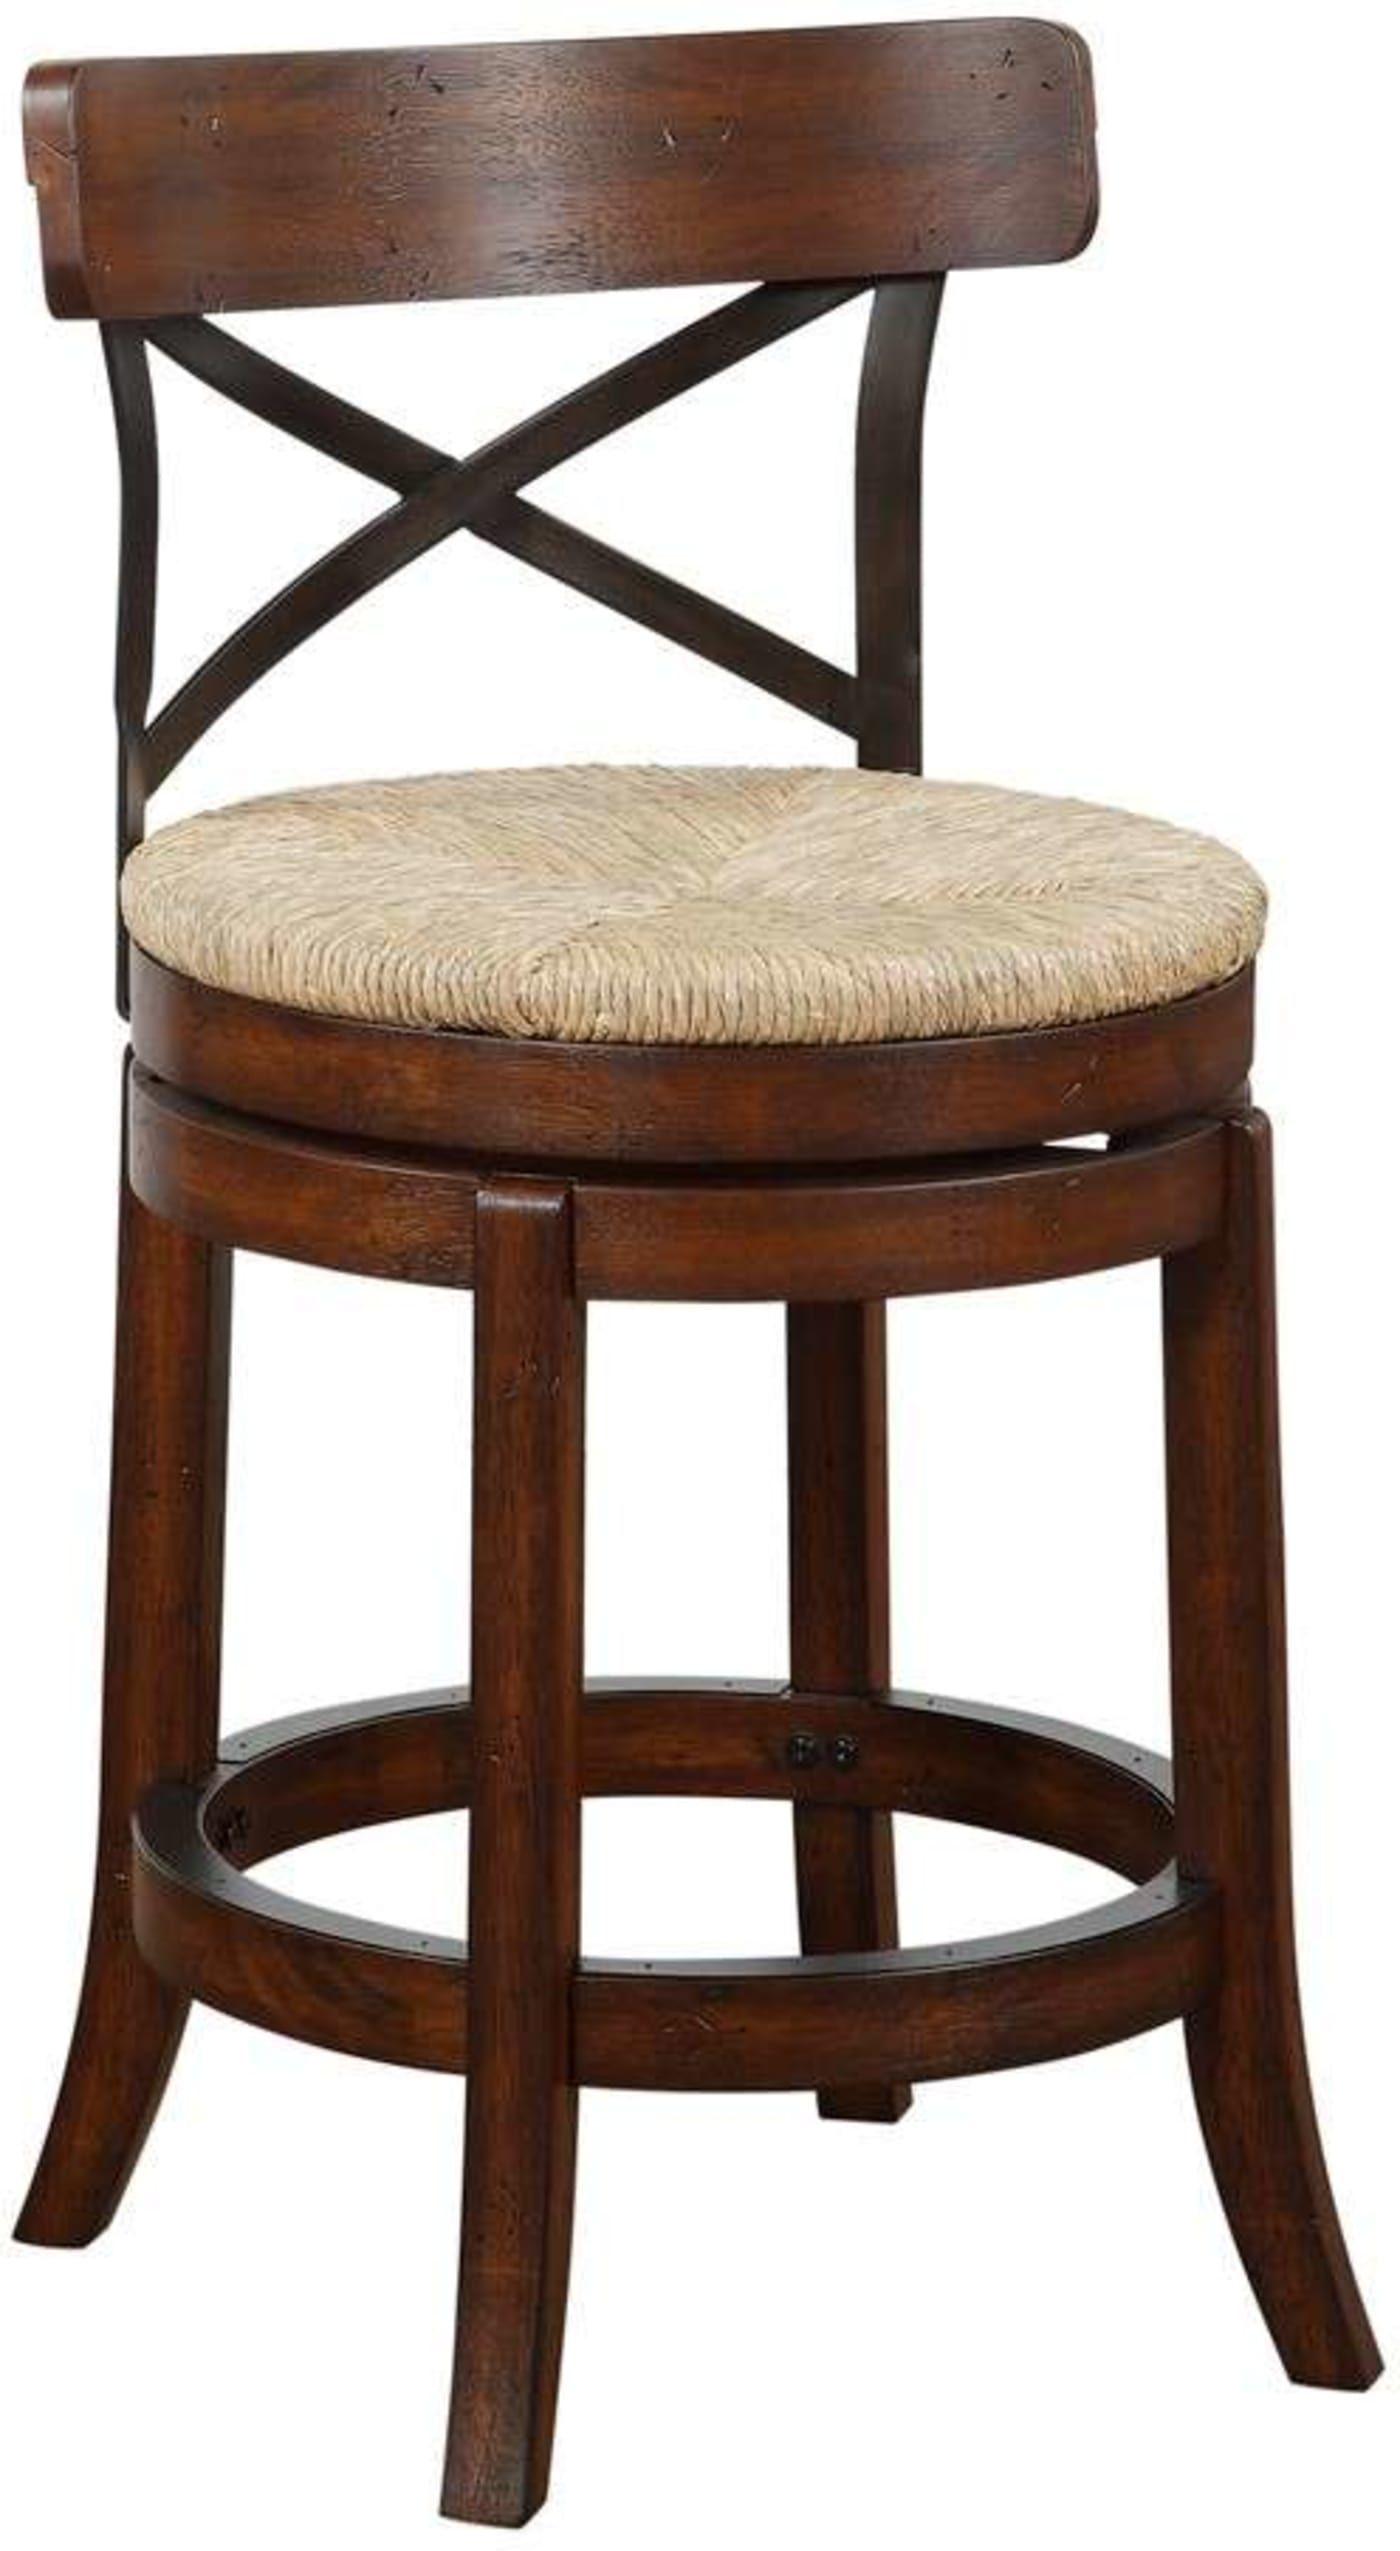 Boraam myrtle mahogony 24 swivel counter stool reviews